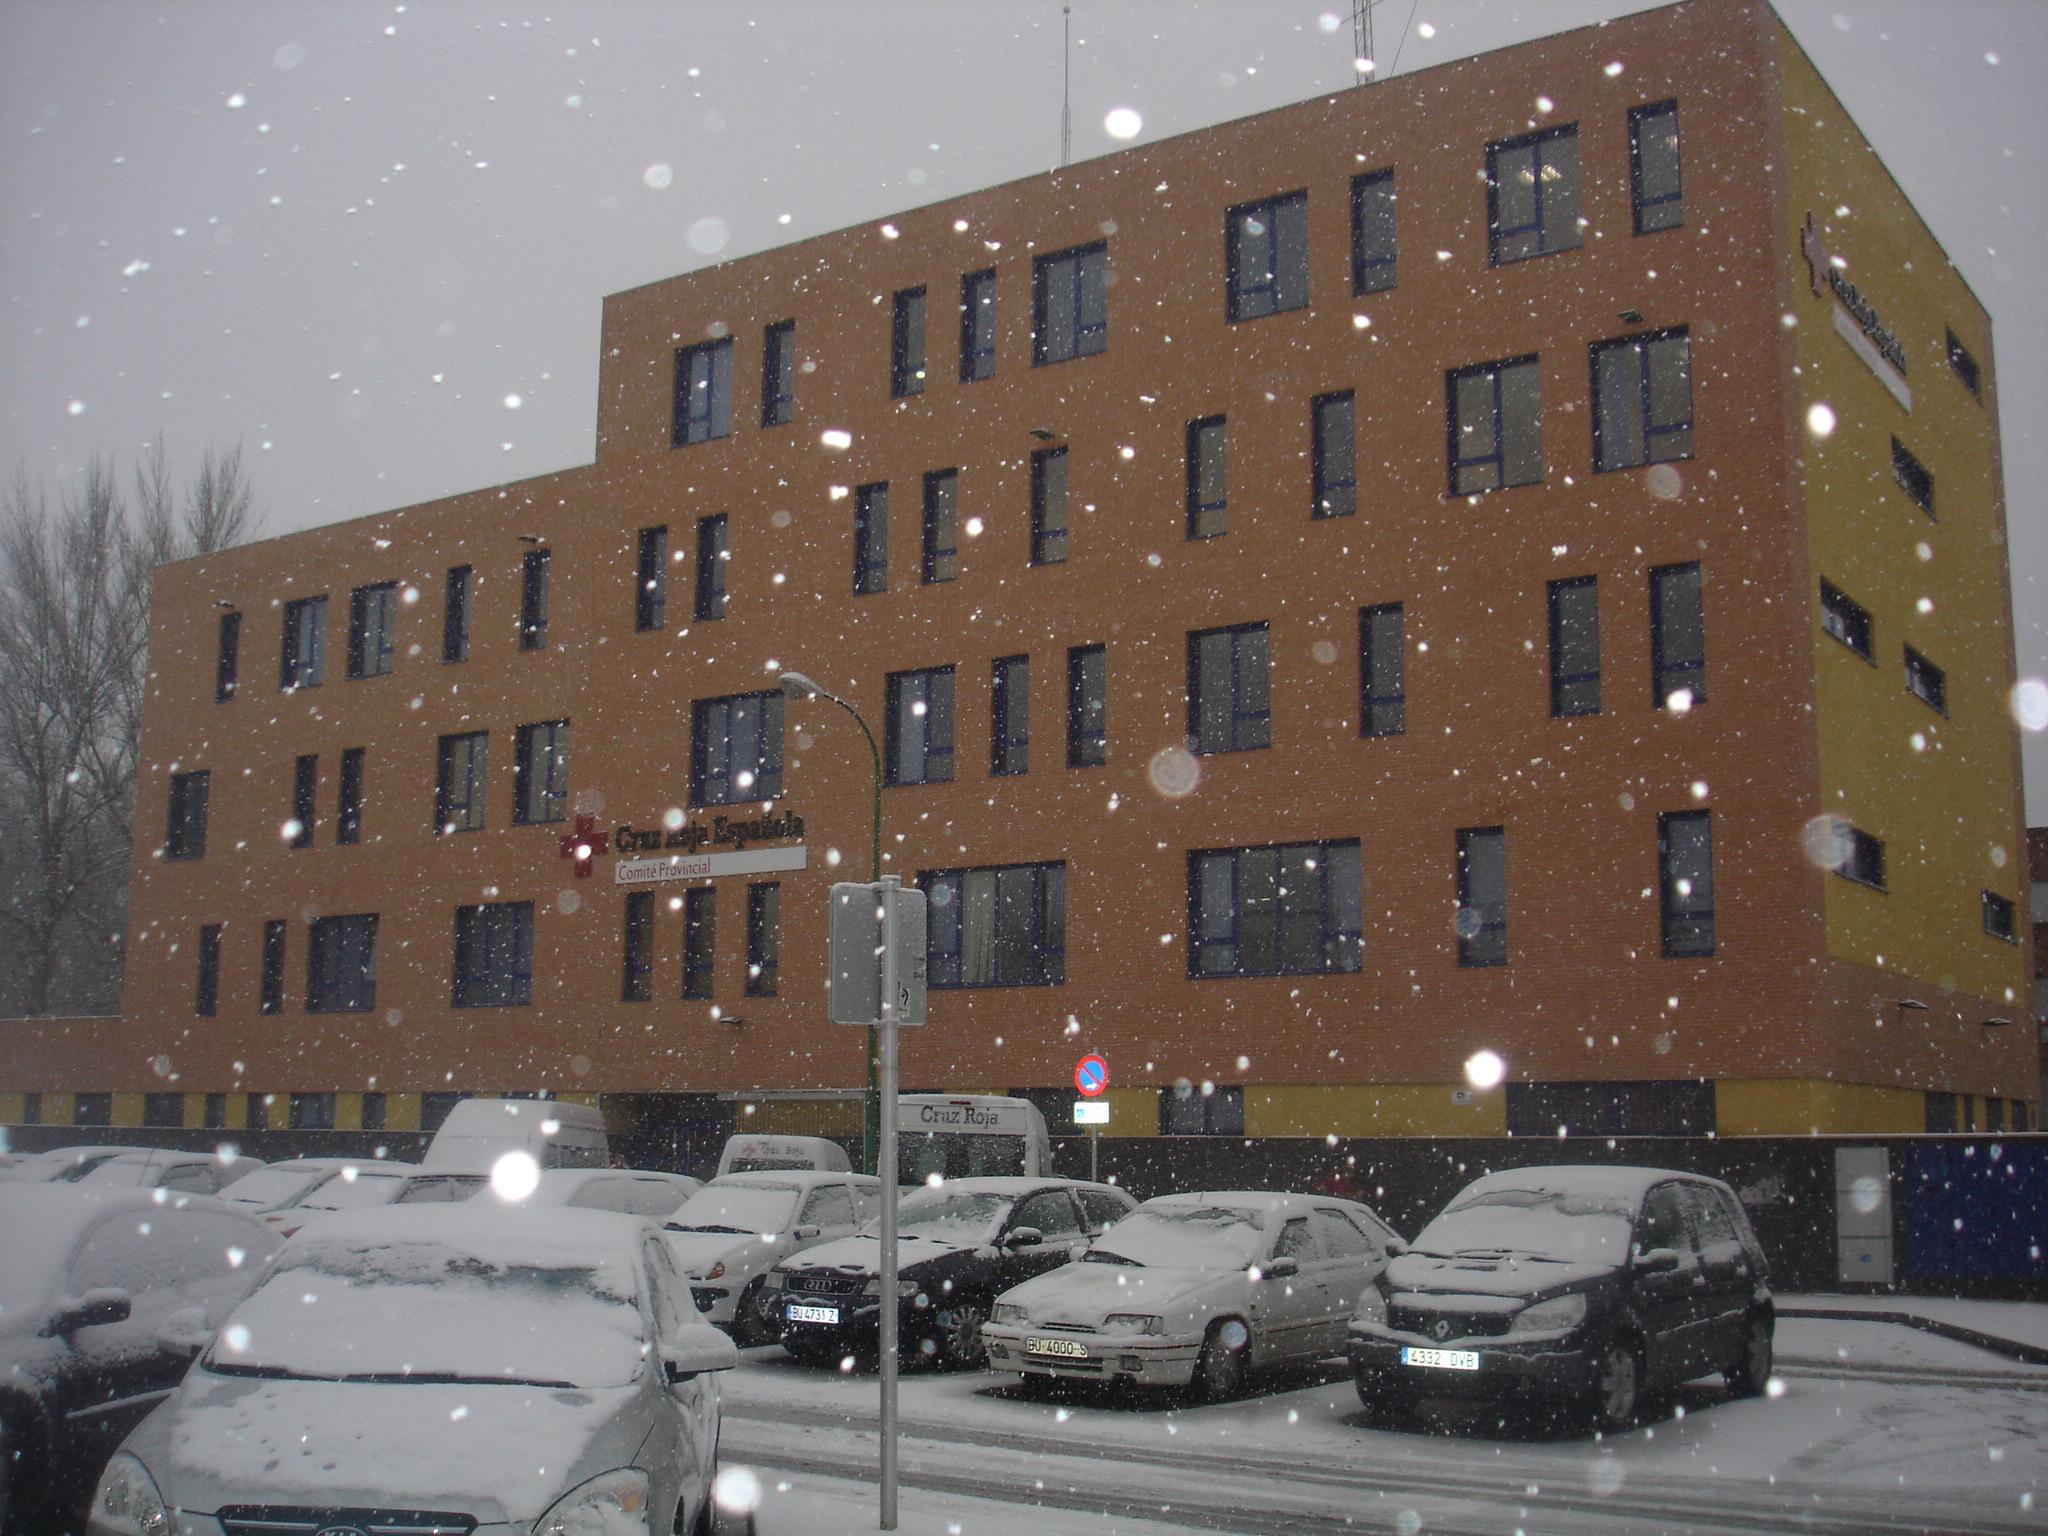 Oficina provincial burgos - Oficinas ibercaja burgos ...